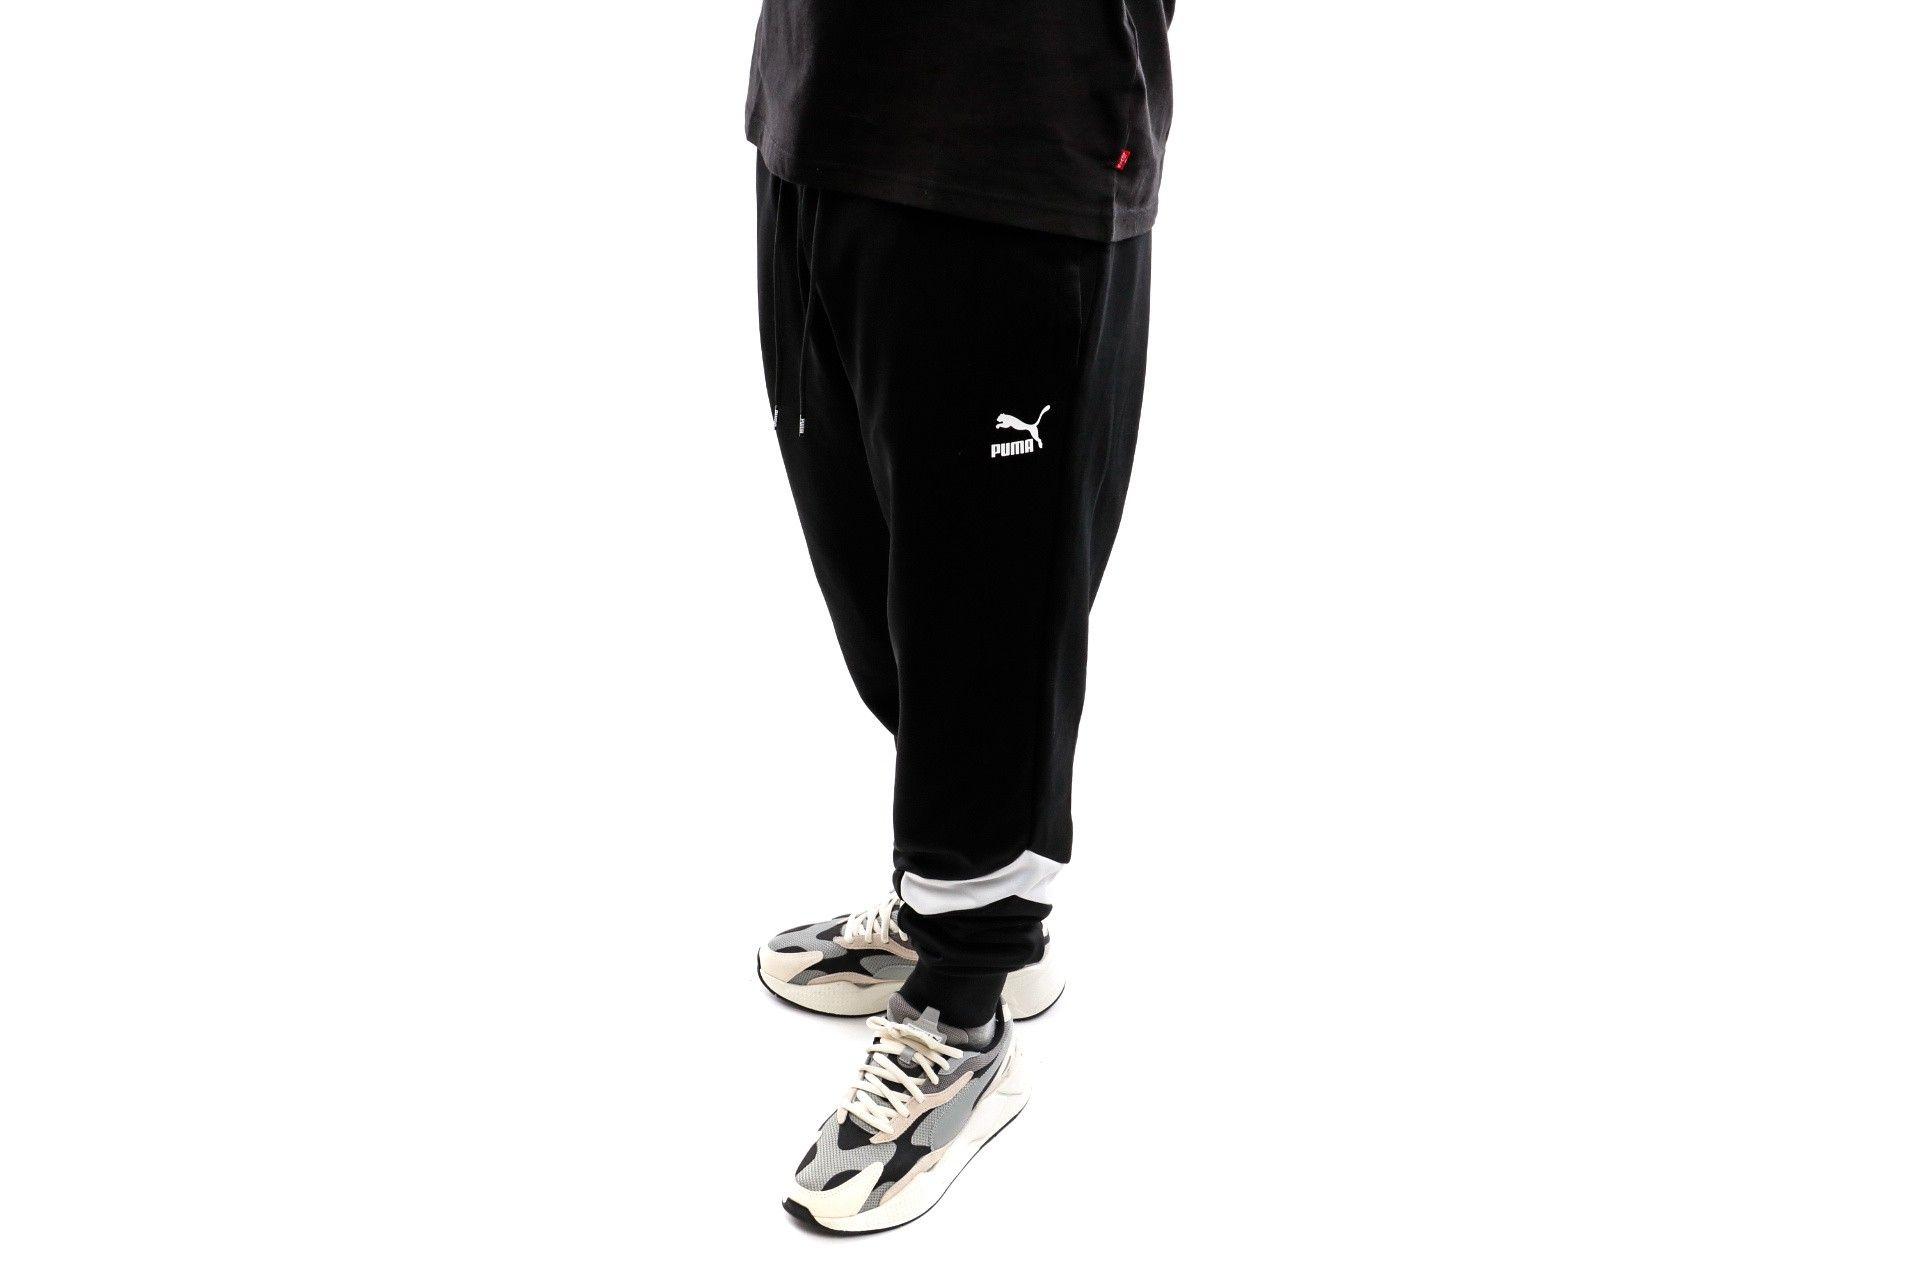 Afbeelding van Puma Trackpant Iconic Mcs Track Pants Pt Puma Black 596445 01